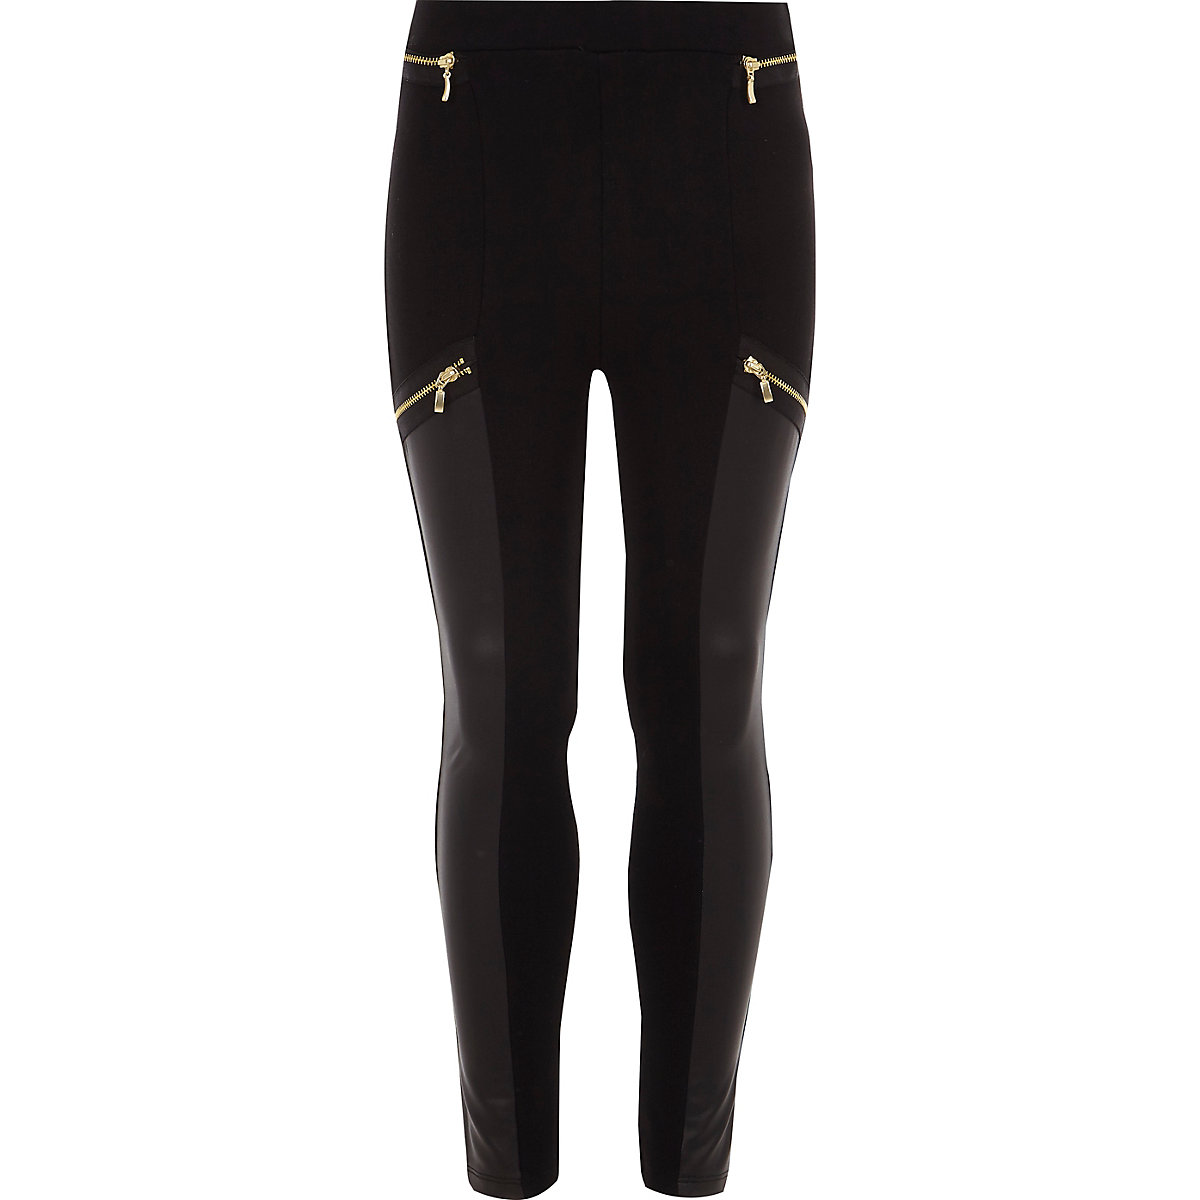 Girls black faux leather panel zip leggings